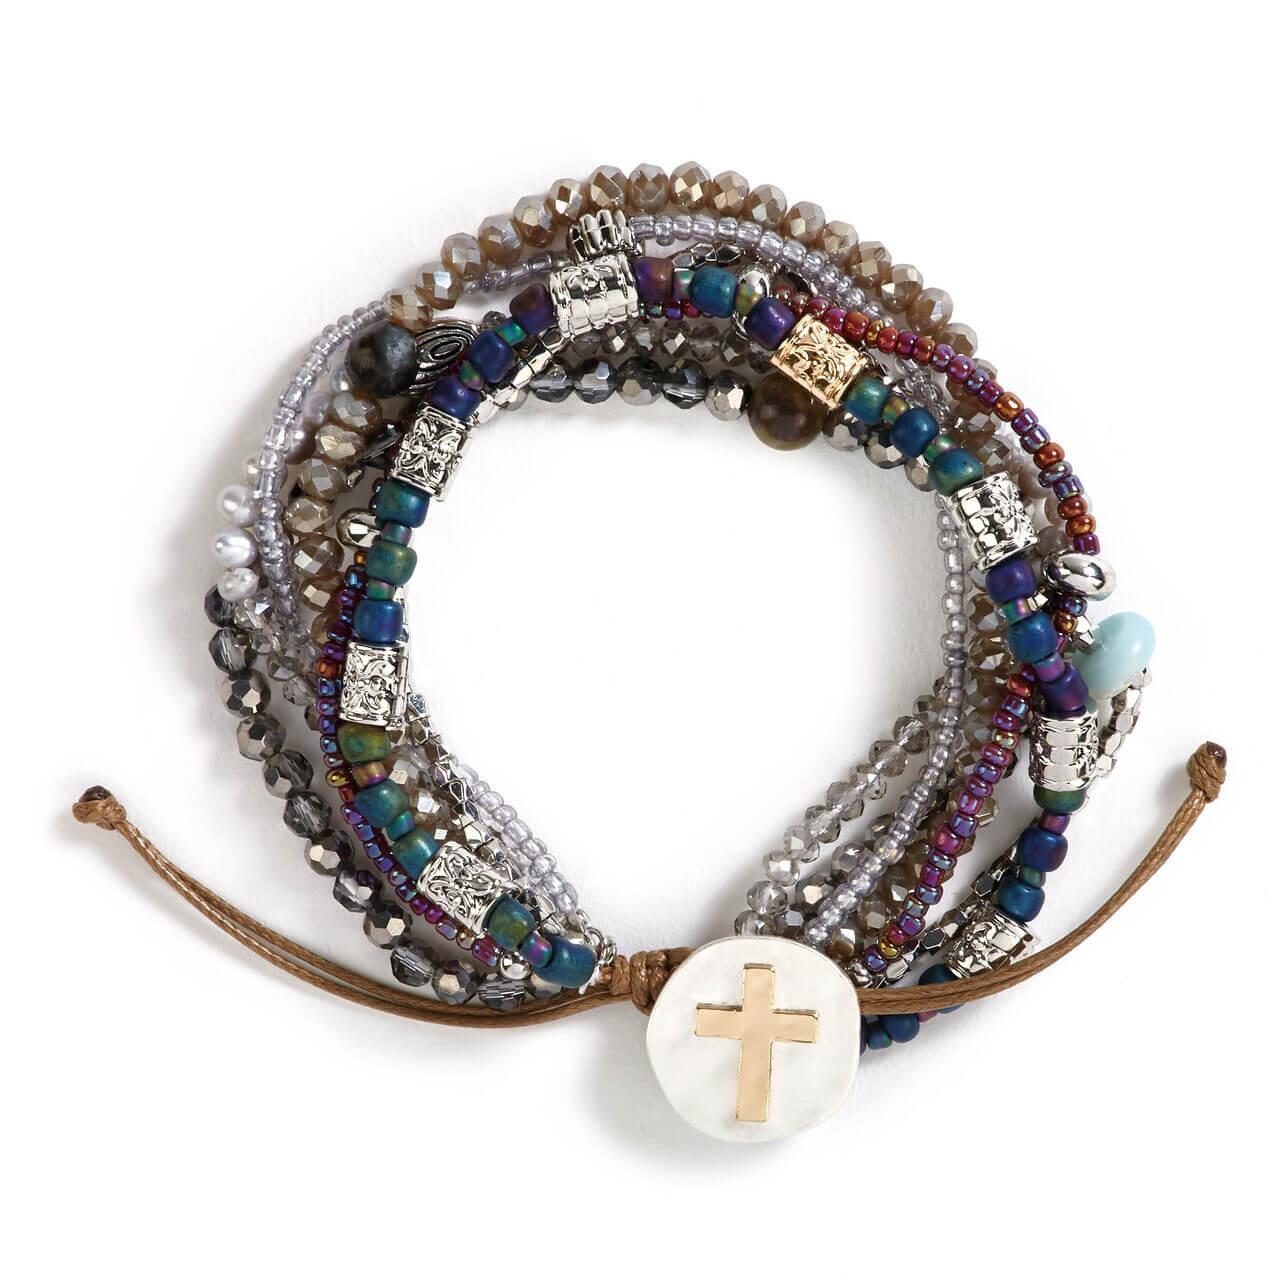 A lot happens in seven days prayer bracelet gray